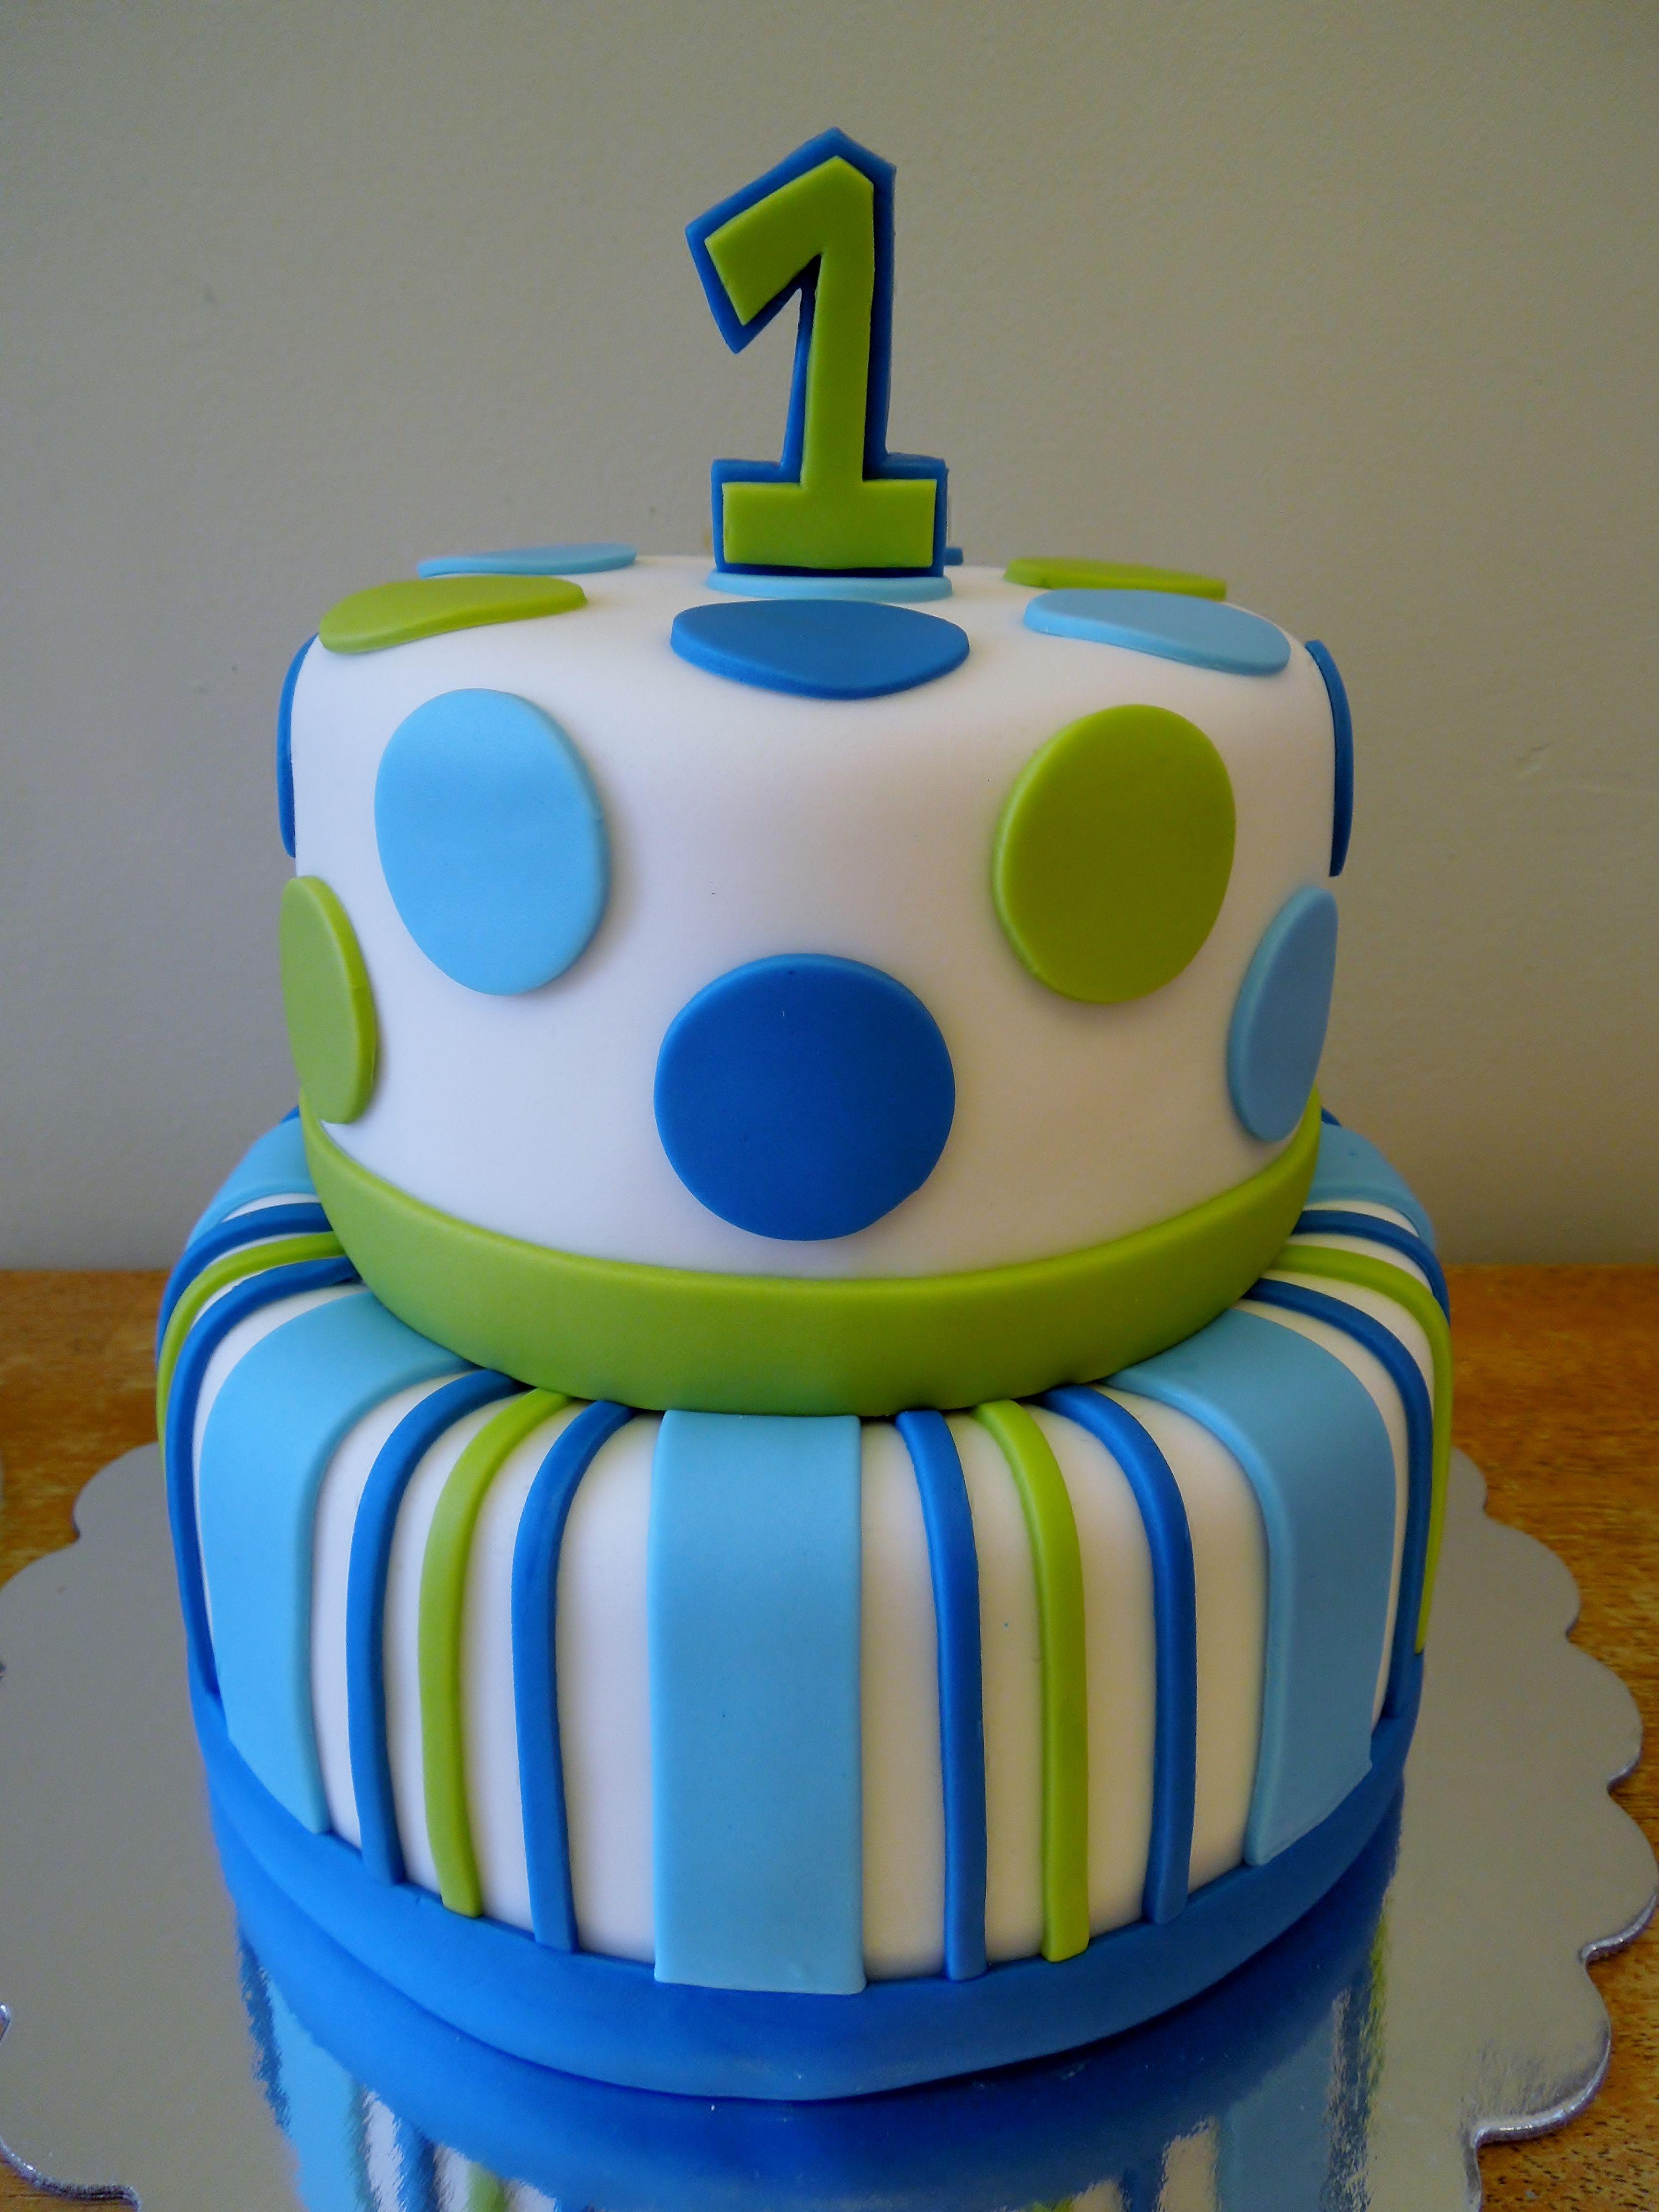 Stripes & Dots Boys 1st Birthday 2 tier vanilla cake